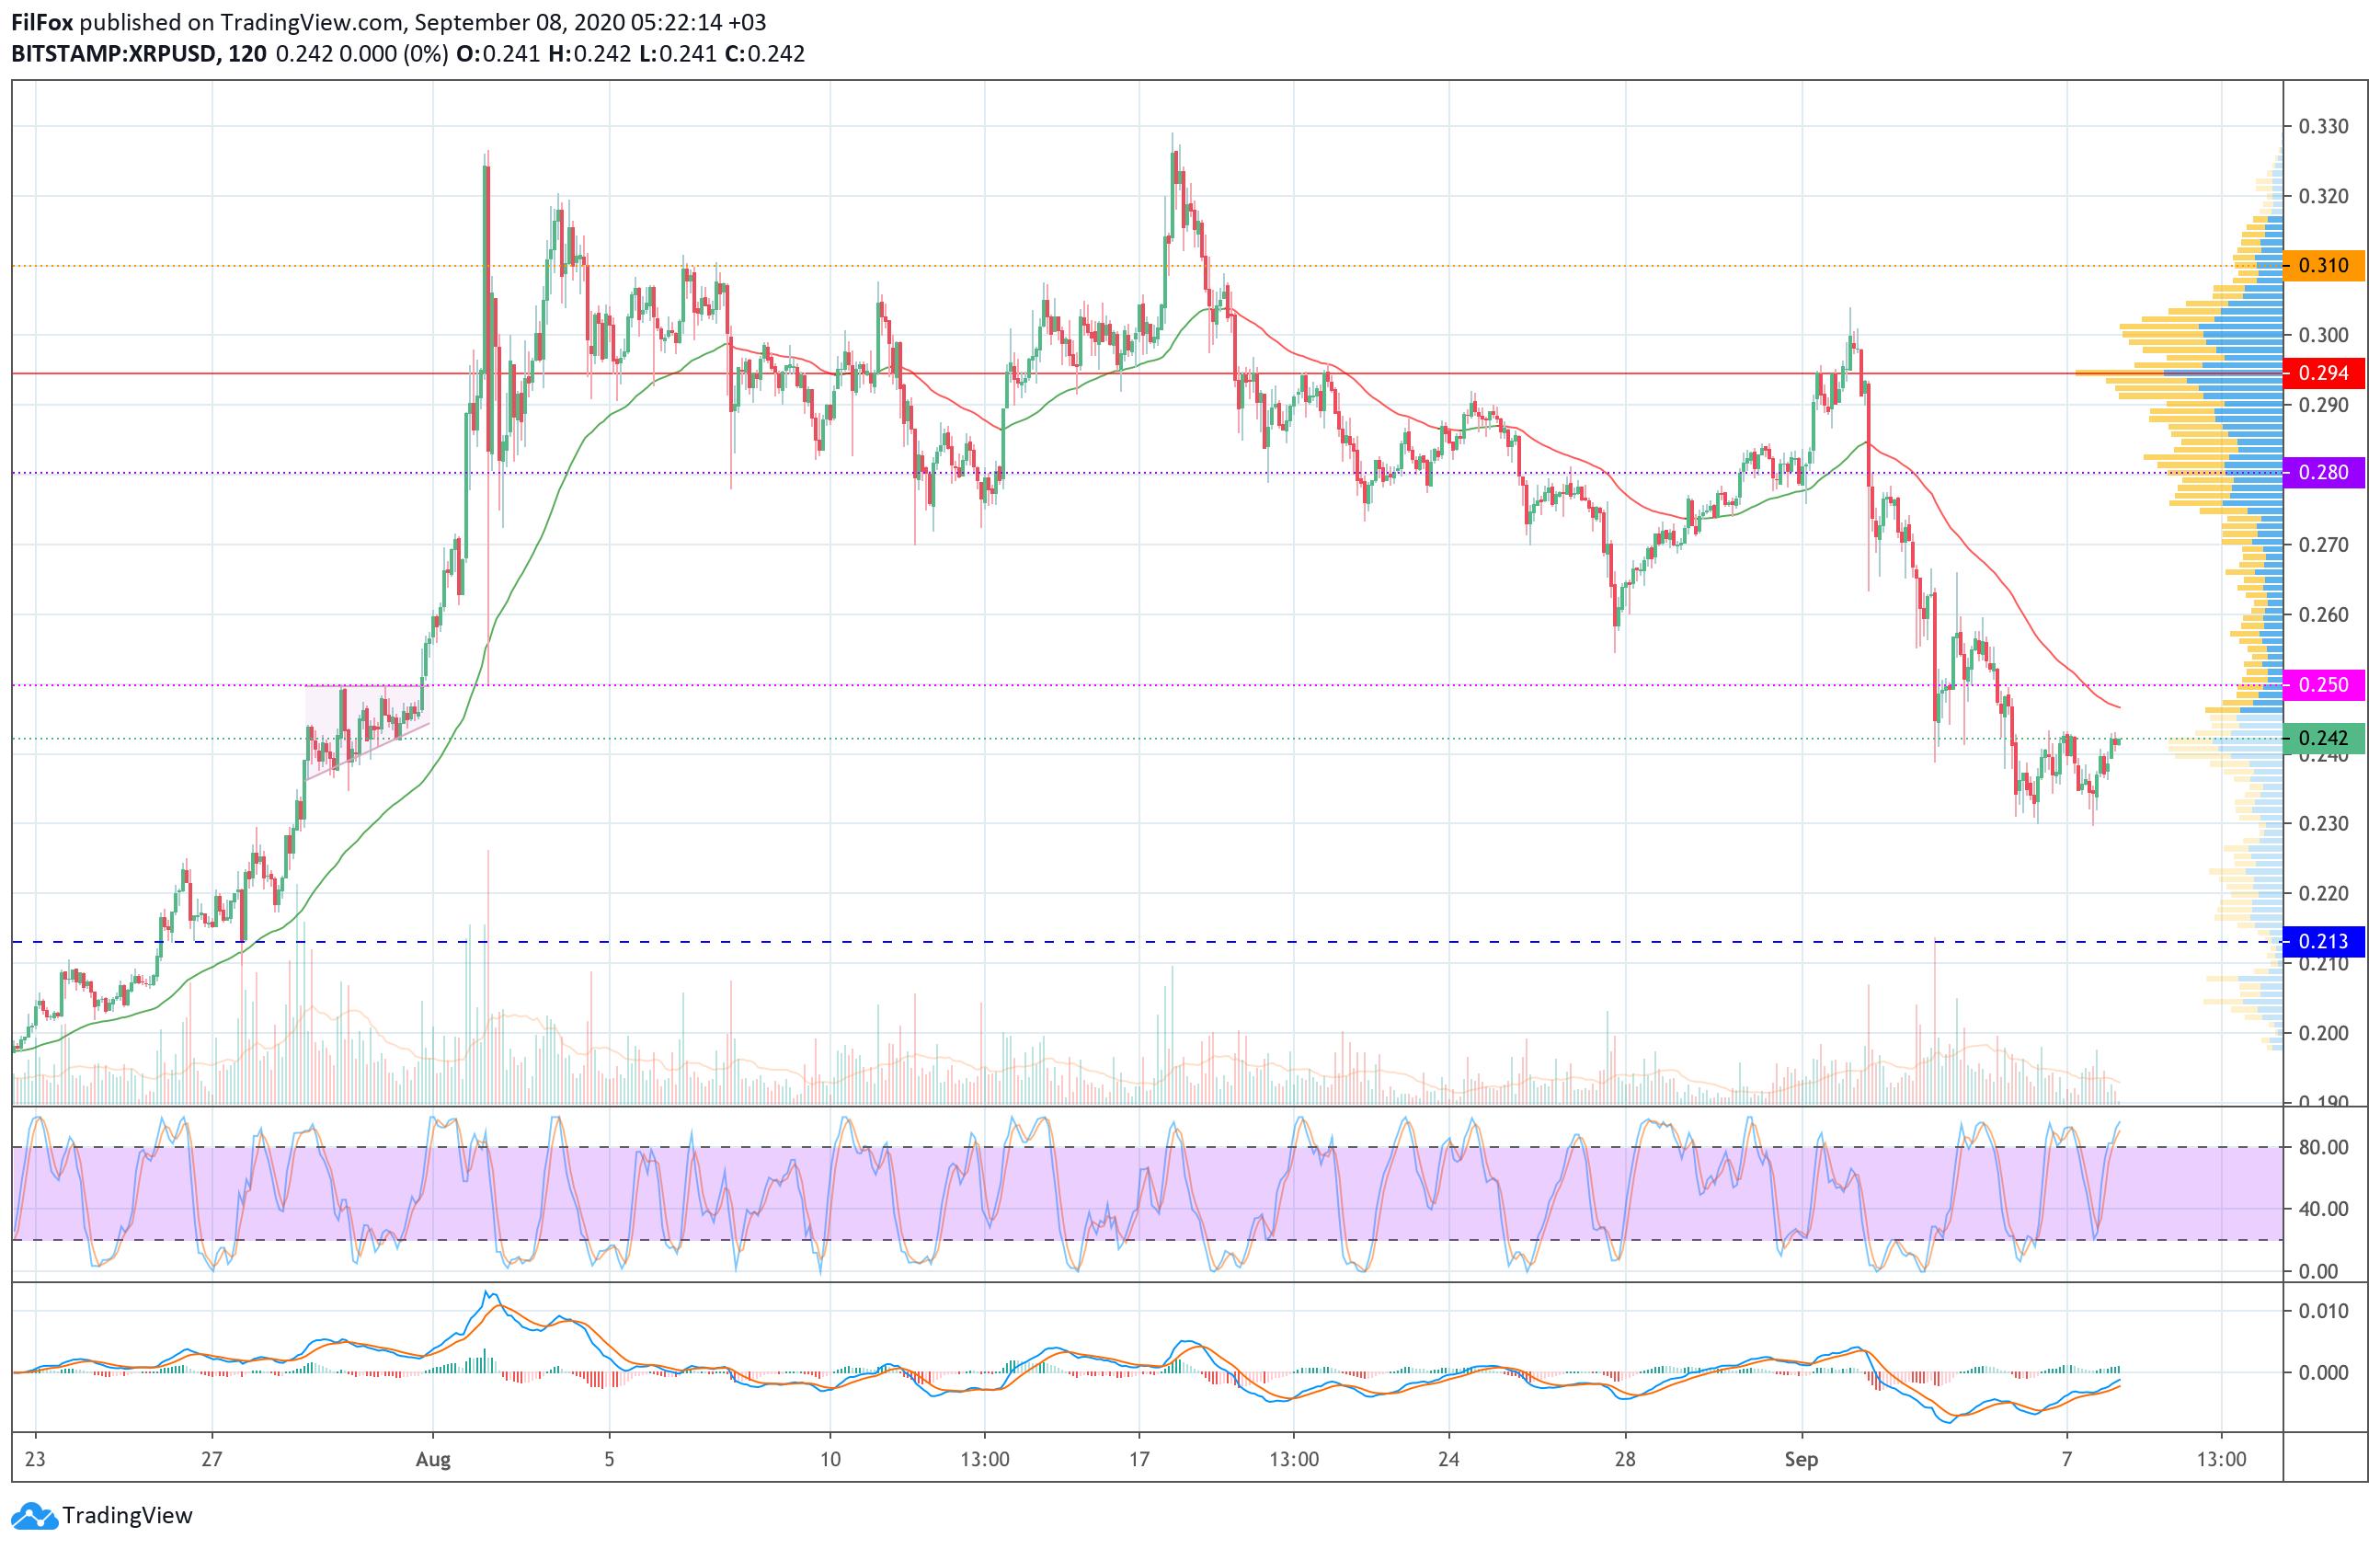 Анализ цен BTC, ETH, XRP (08.09.20)